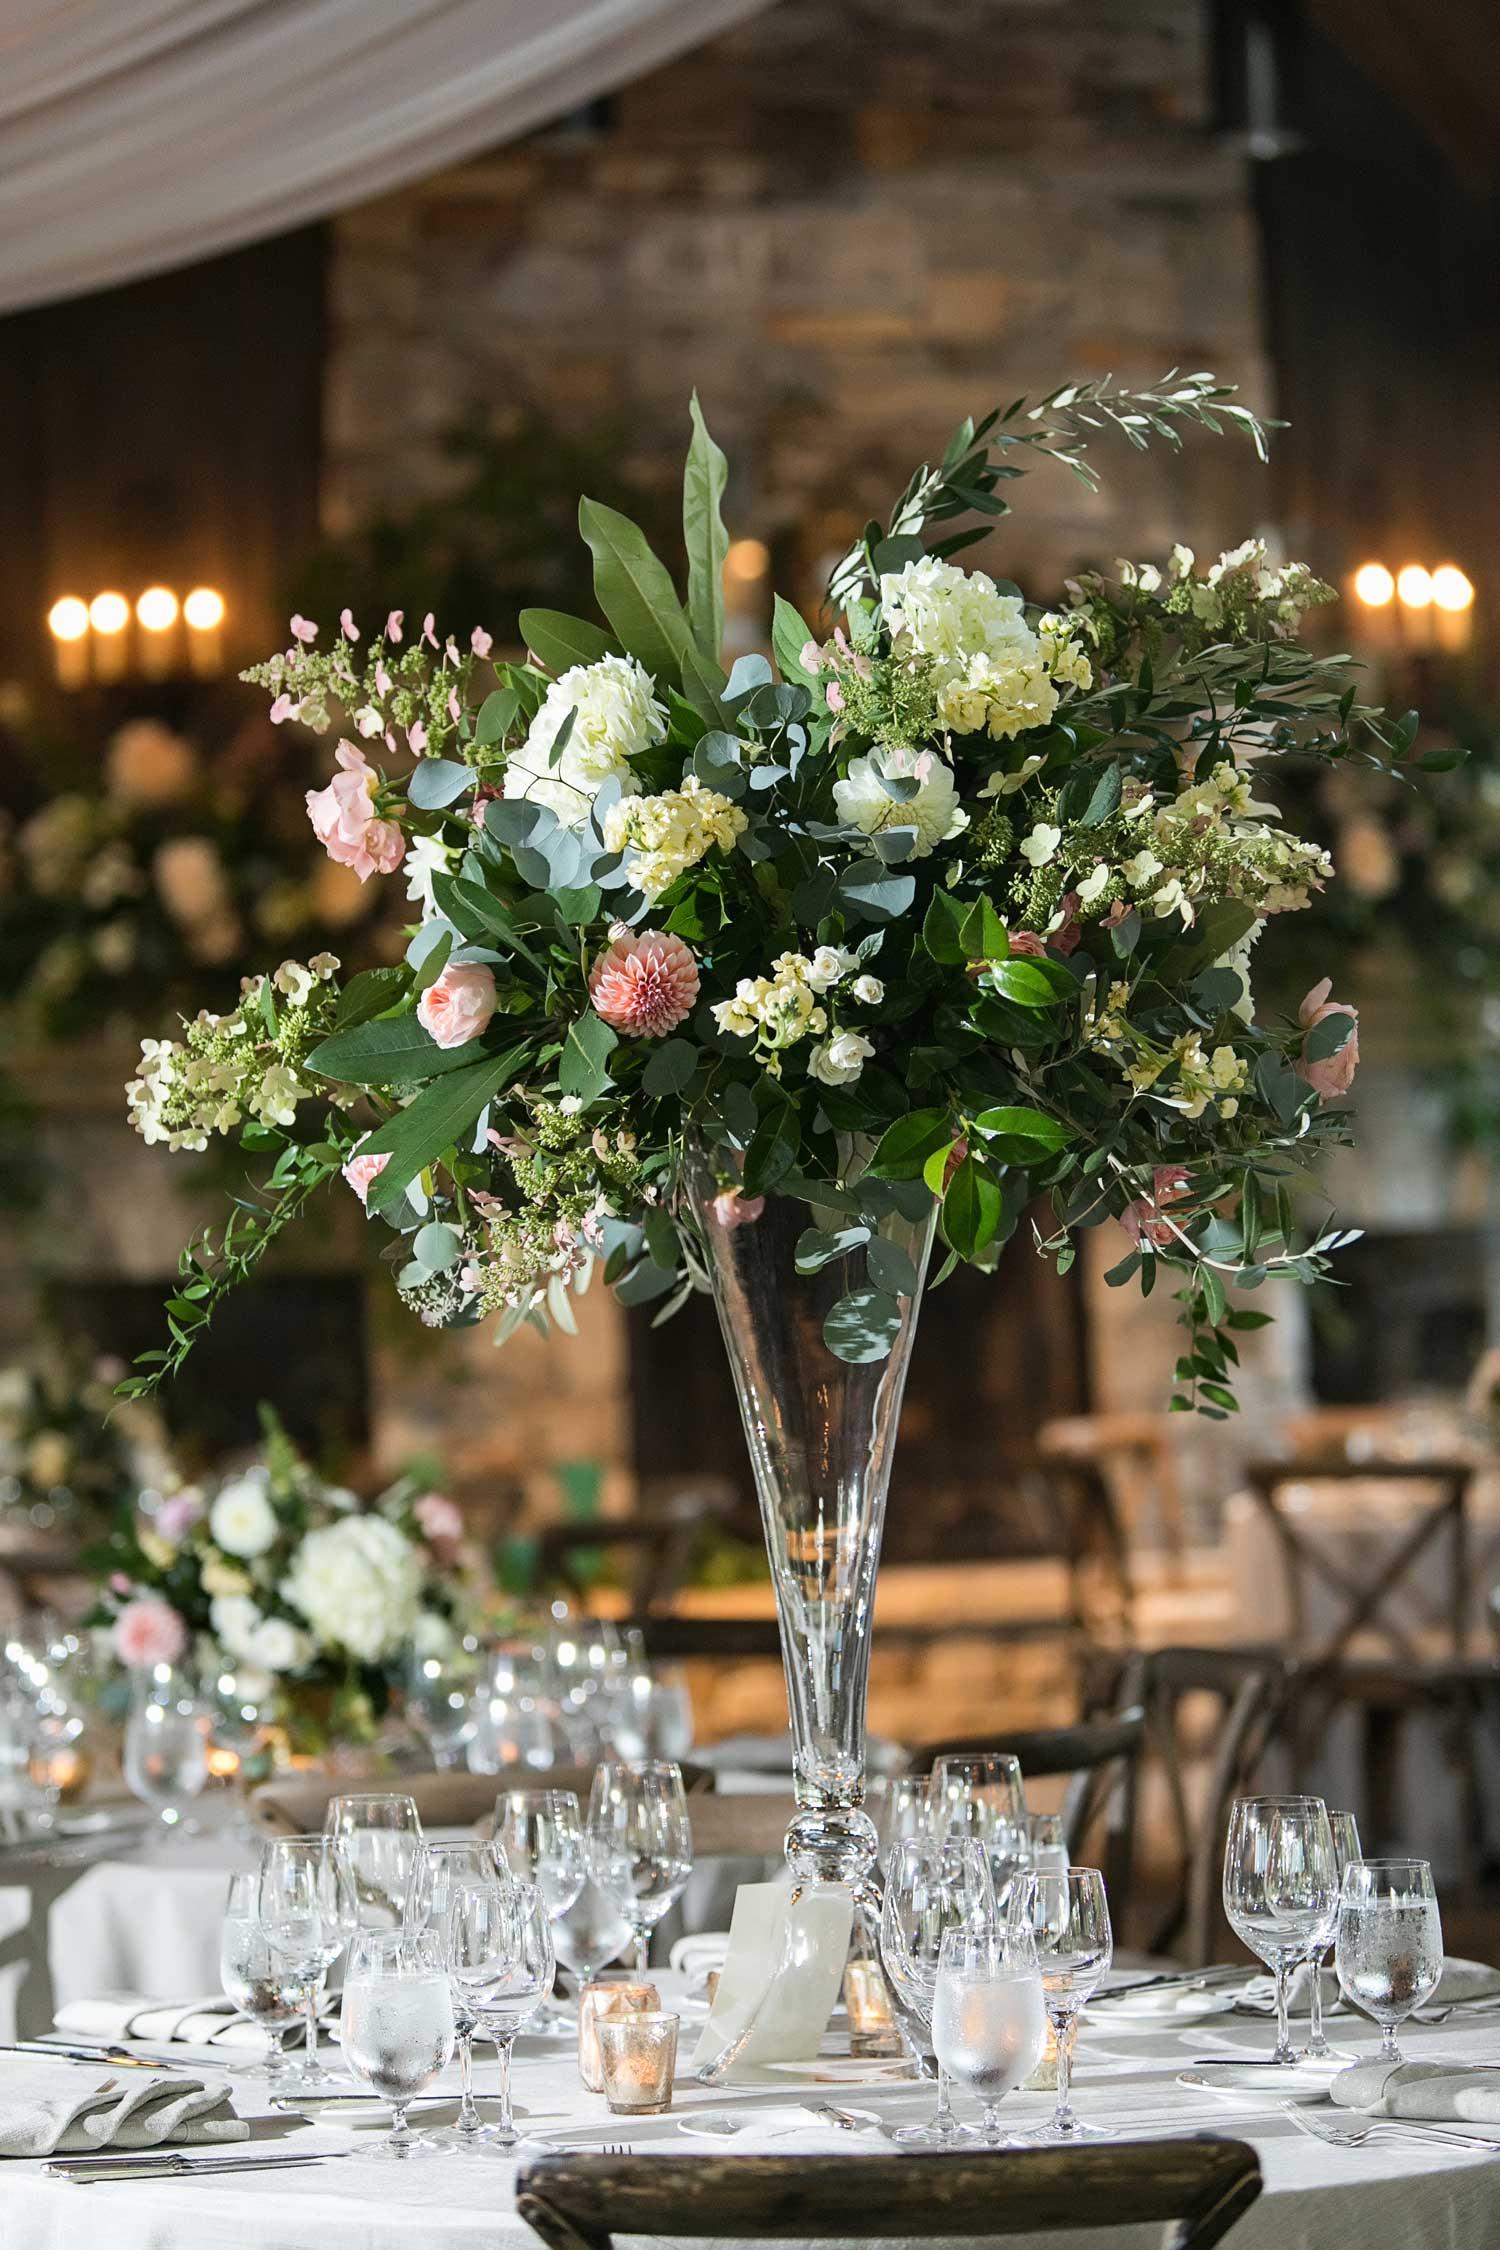 rustic wedding centerpiece greenery pink dahlia white flower tall centerpiece